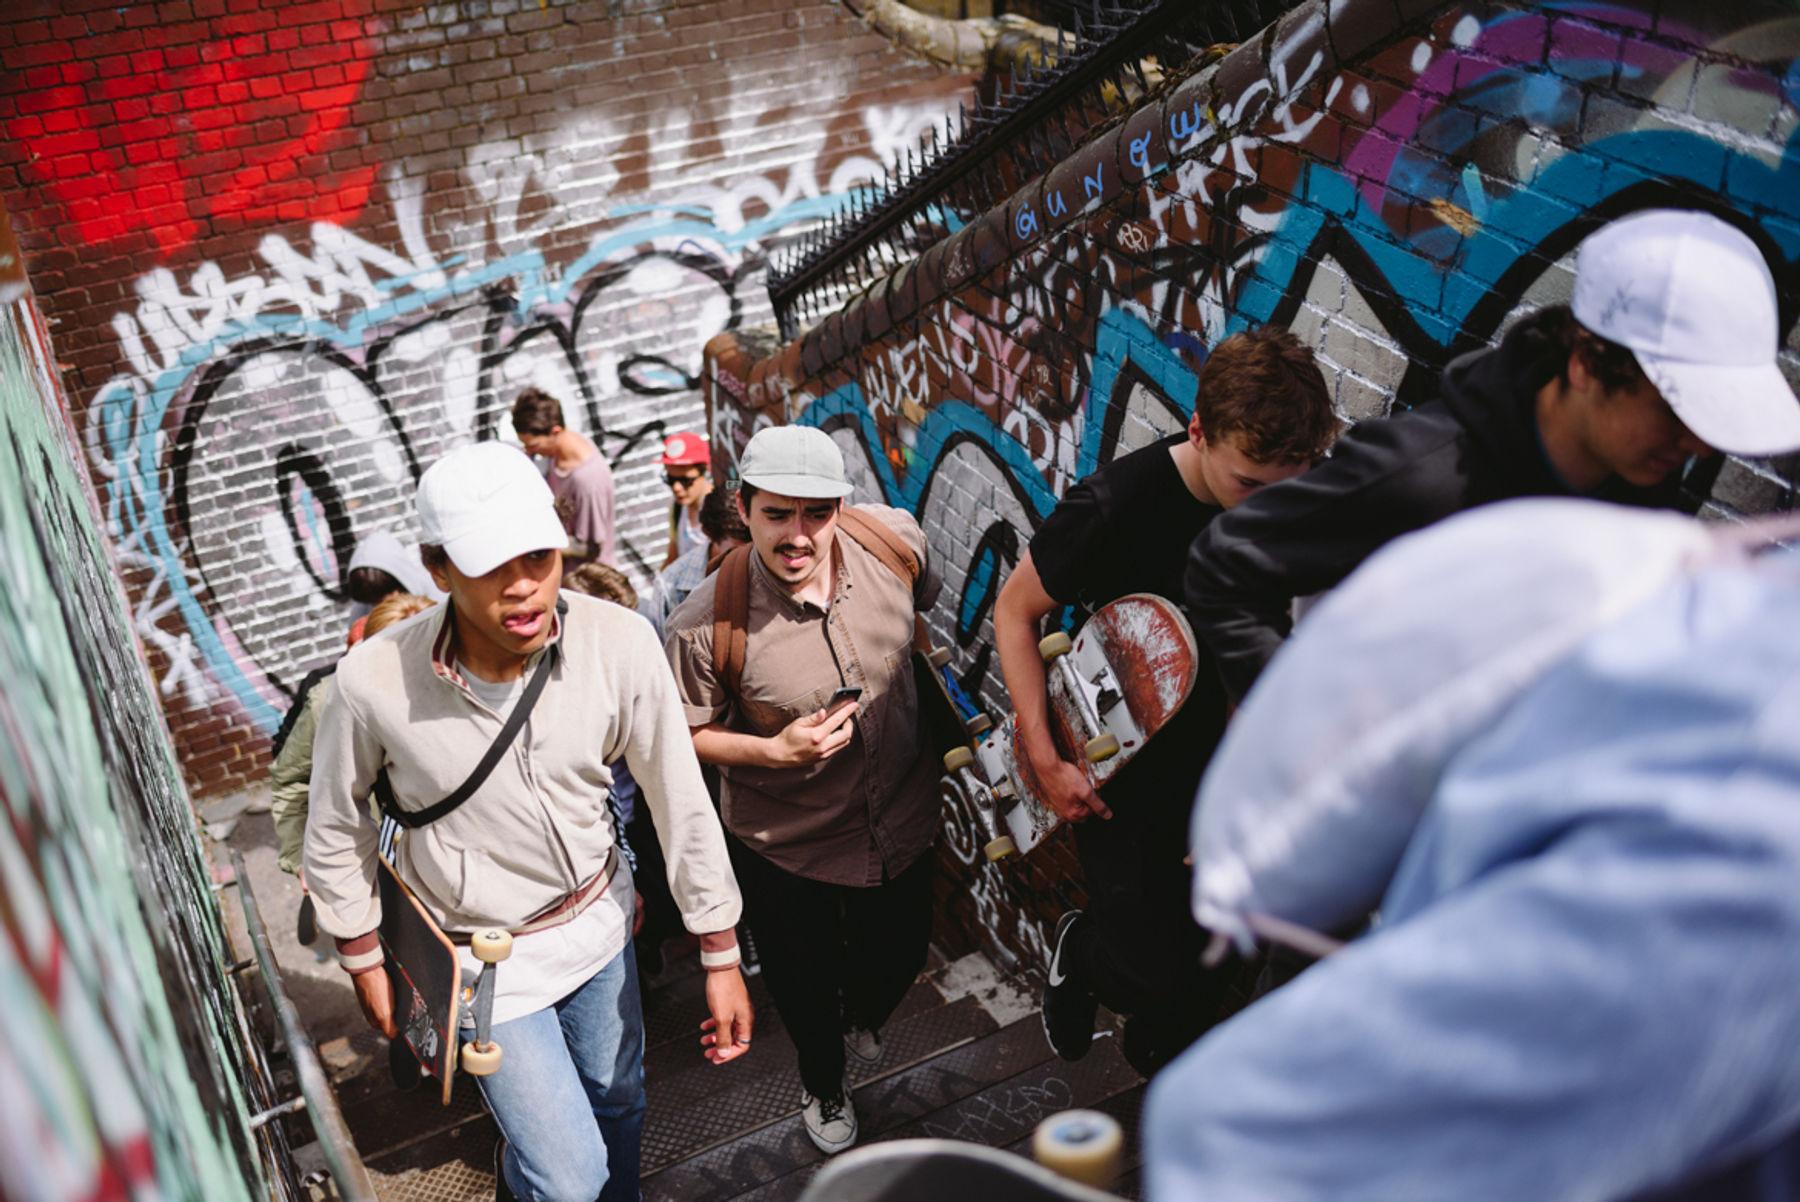 _IHC7705e-Nike-SB-x-Slam-City-Skates-Go-Skateboarding-Day-London-June-2015-Photographer-Maksim-Kalanep